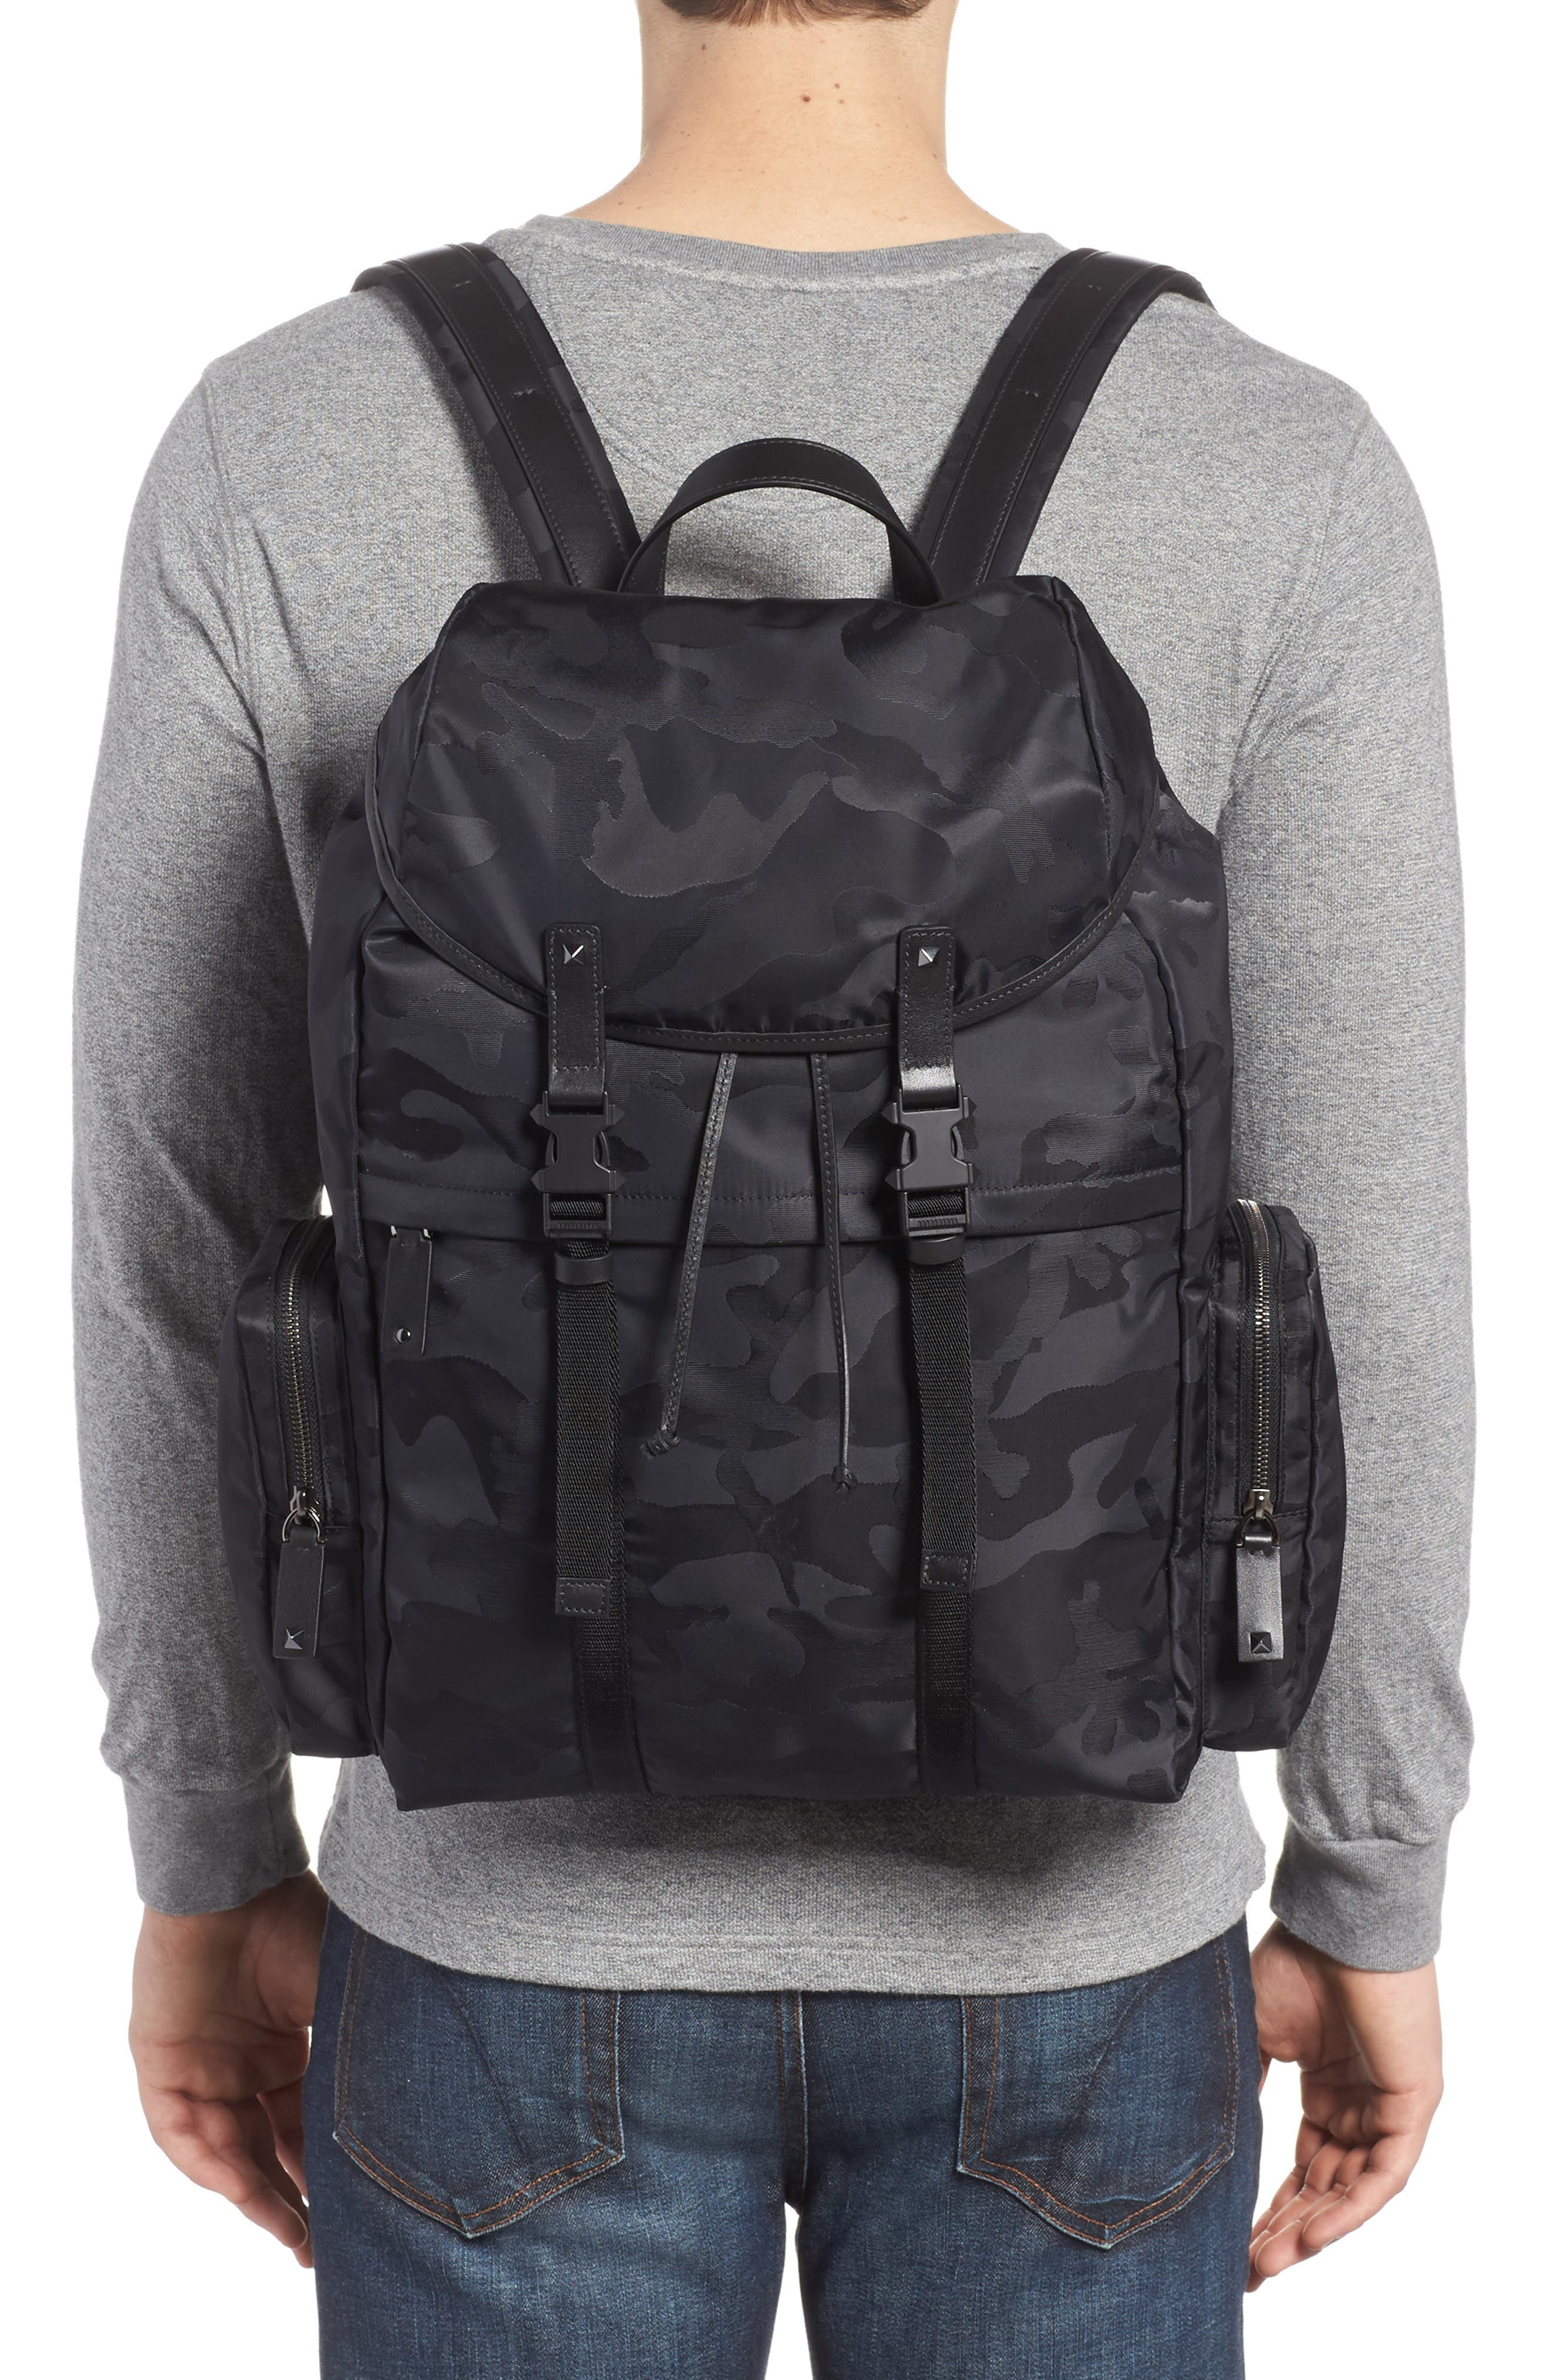 Camo Backpack,                             Alternate thumbnail 2, color,                             Black